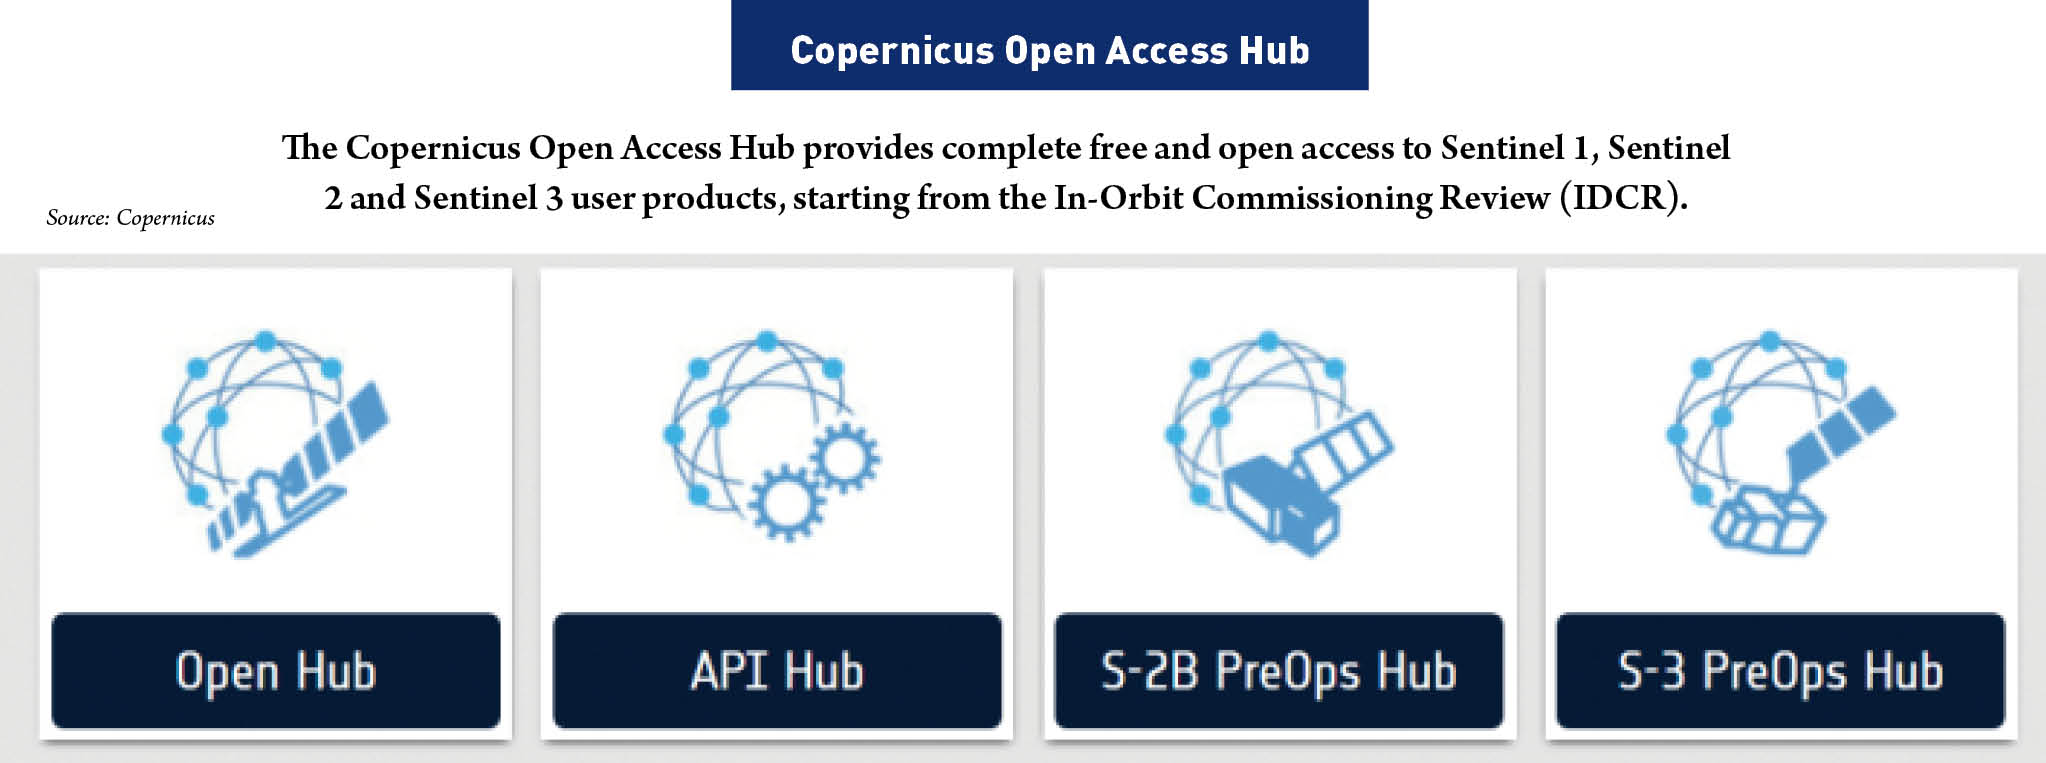 Free and open data makes Copernicus a gamechanger: ESA's Josef